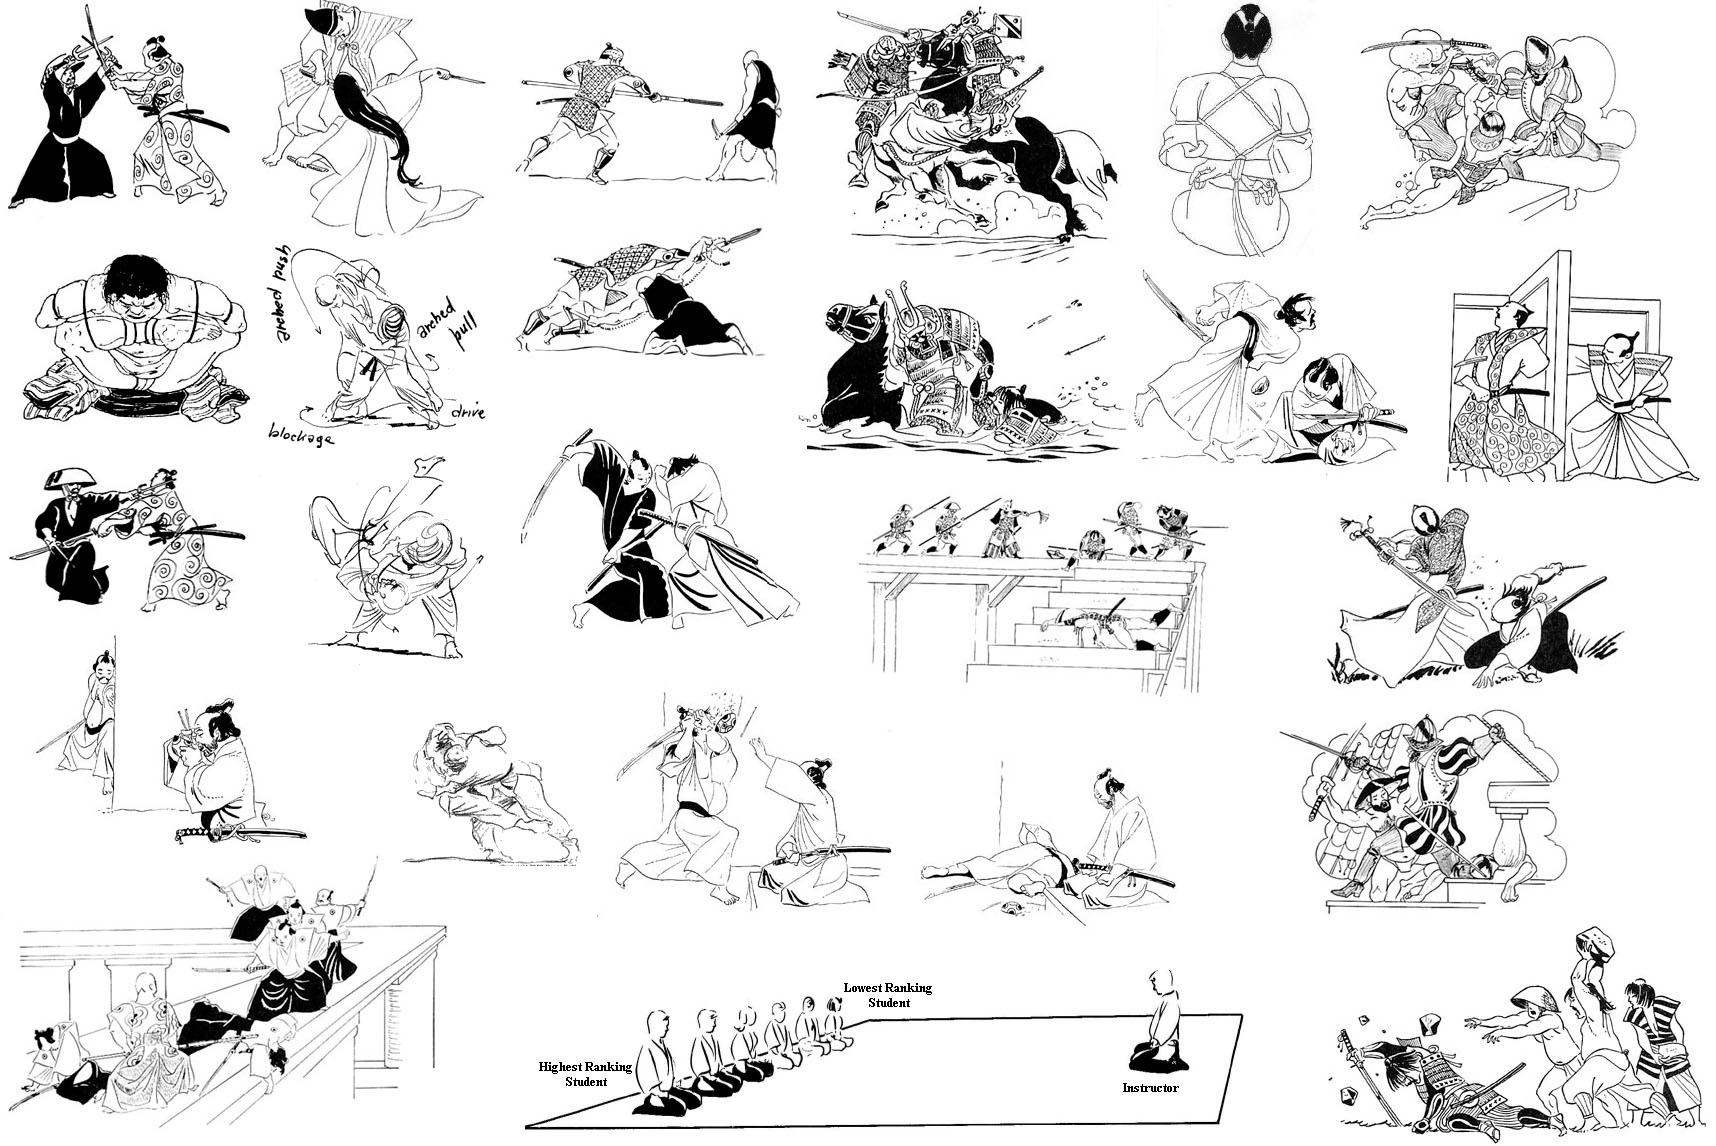 Рисунки Айкидо от О. Ратти